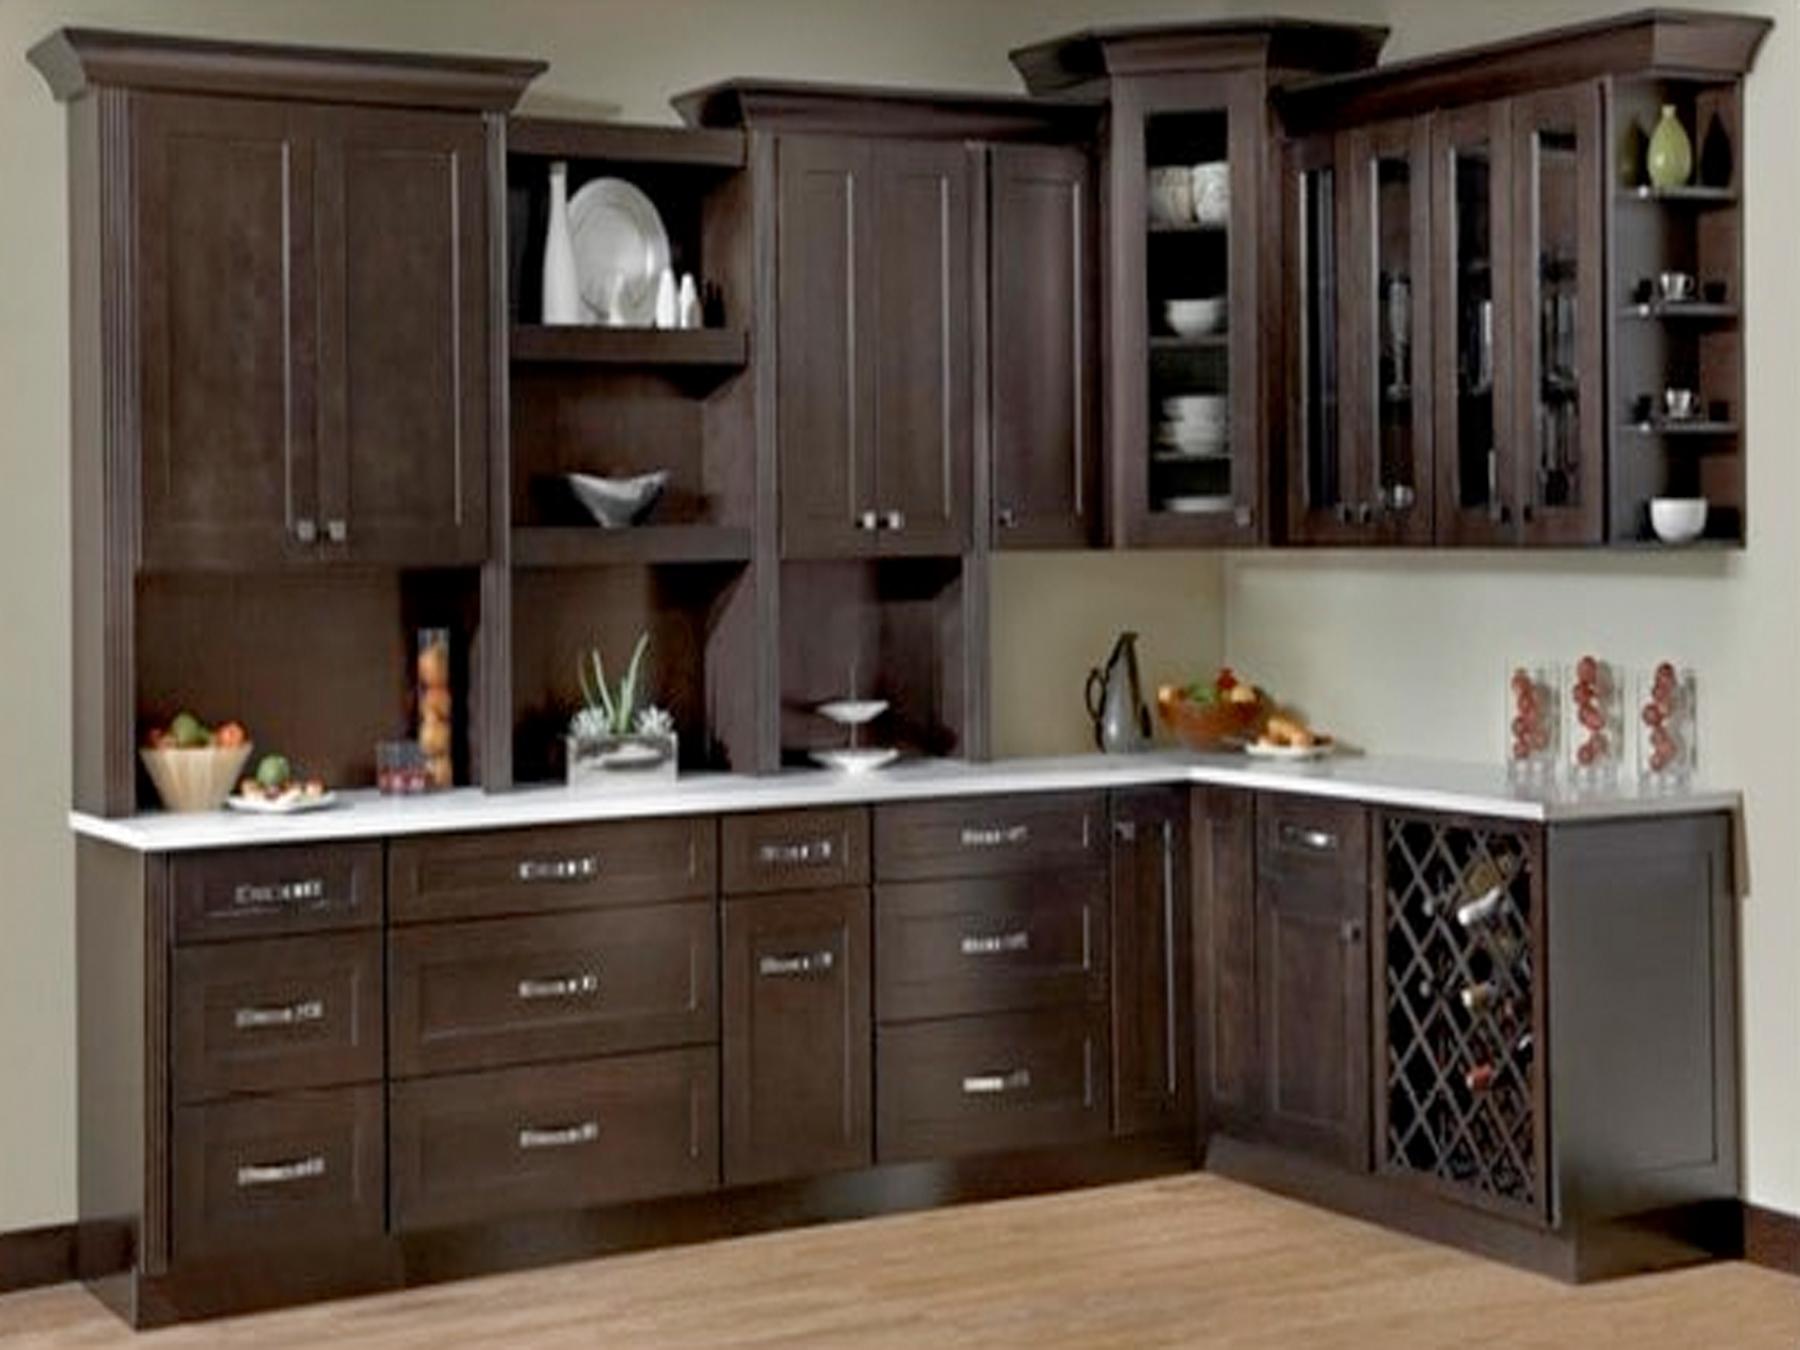 Java Shaker Kitchen Kraftsman Cabinetry